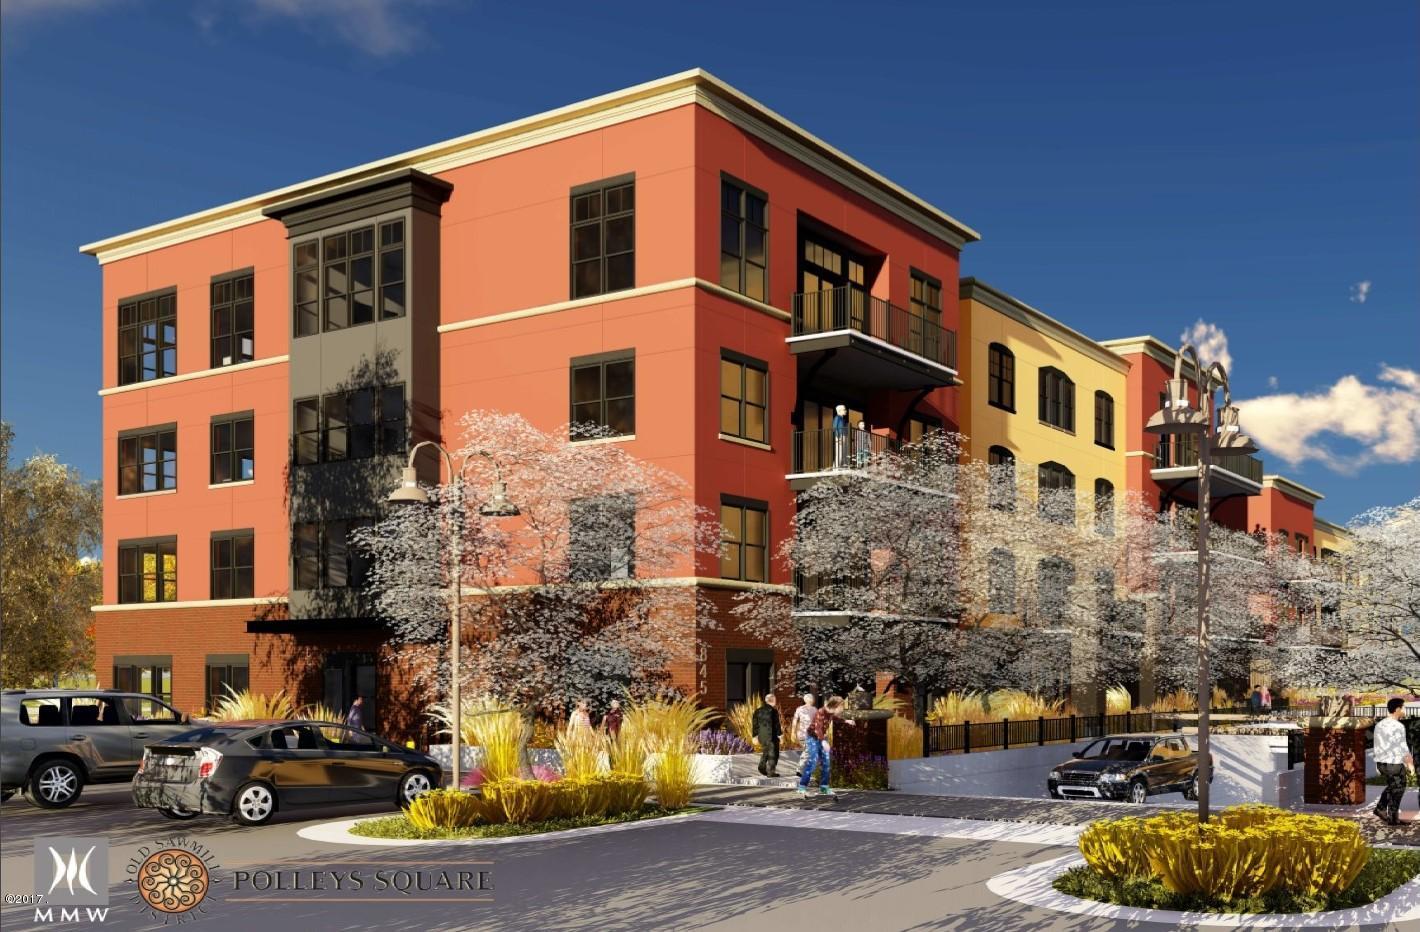 845 Wyoming Street Suite 302, Missoula, MT 59801